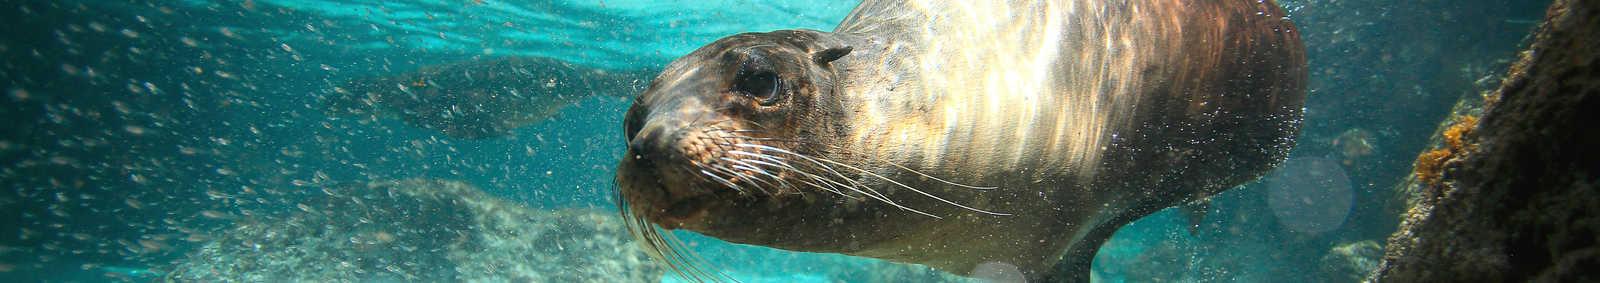 a swimming sea lion